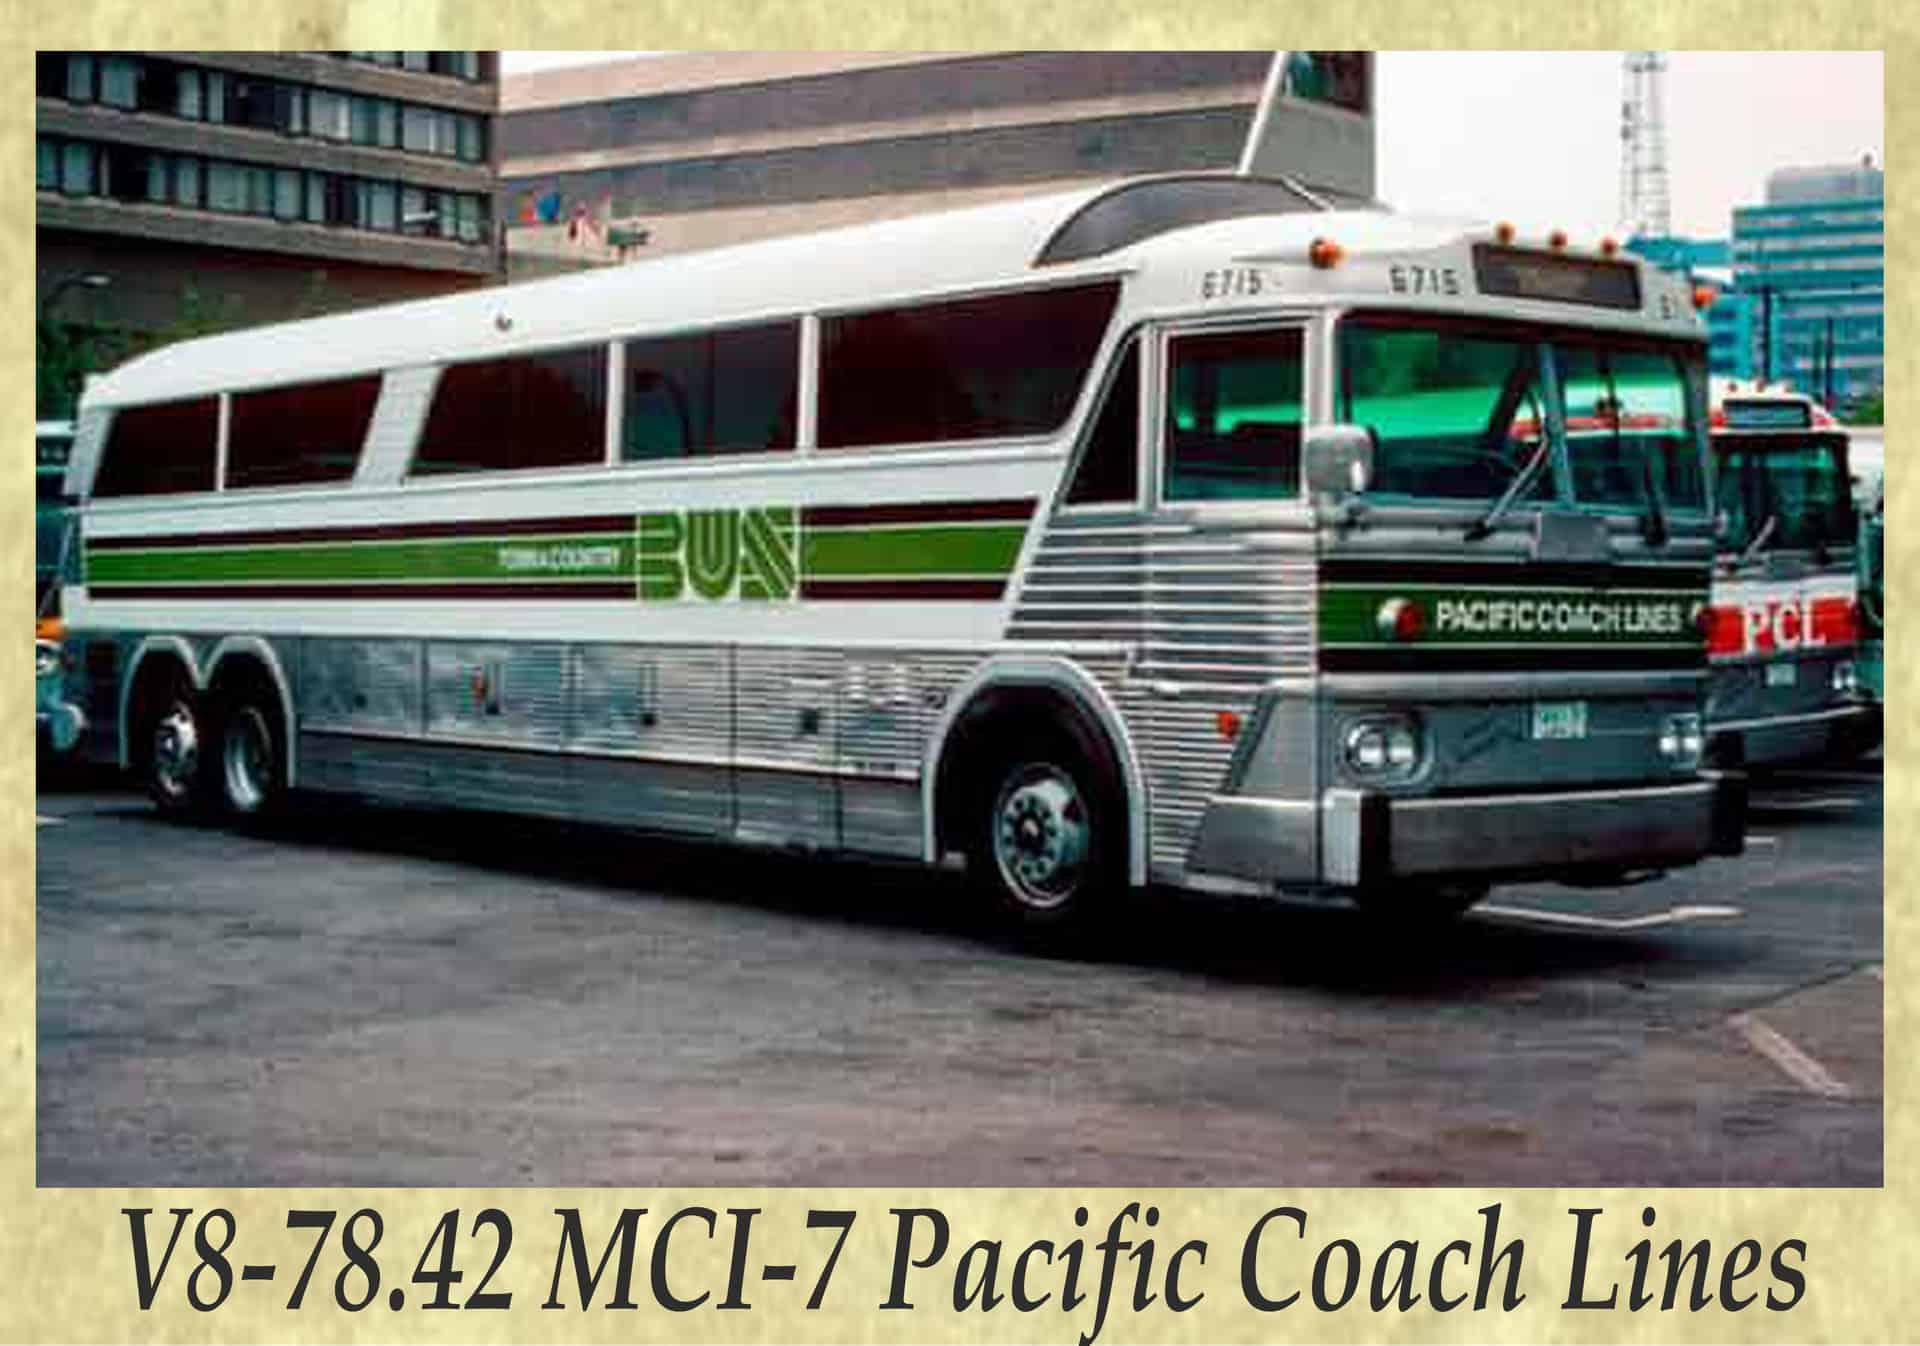 V8-78.42 MCI-7 Pacific Coach Lines